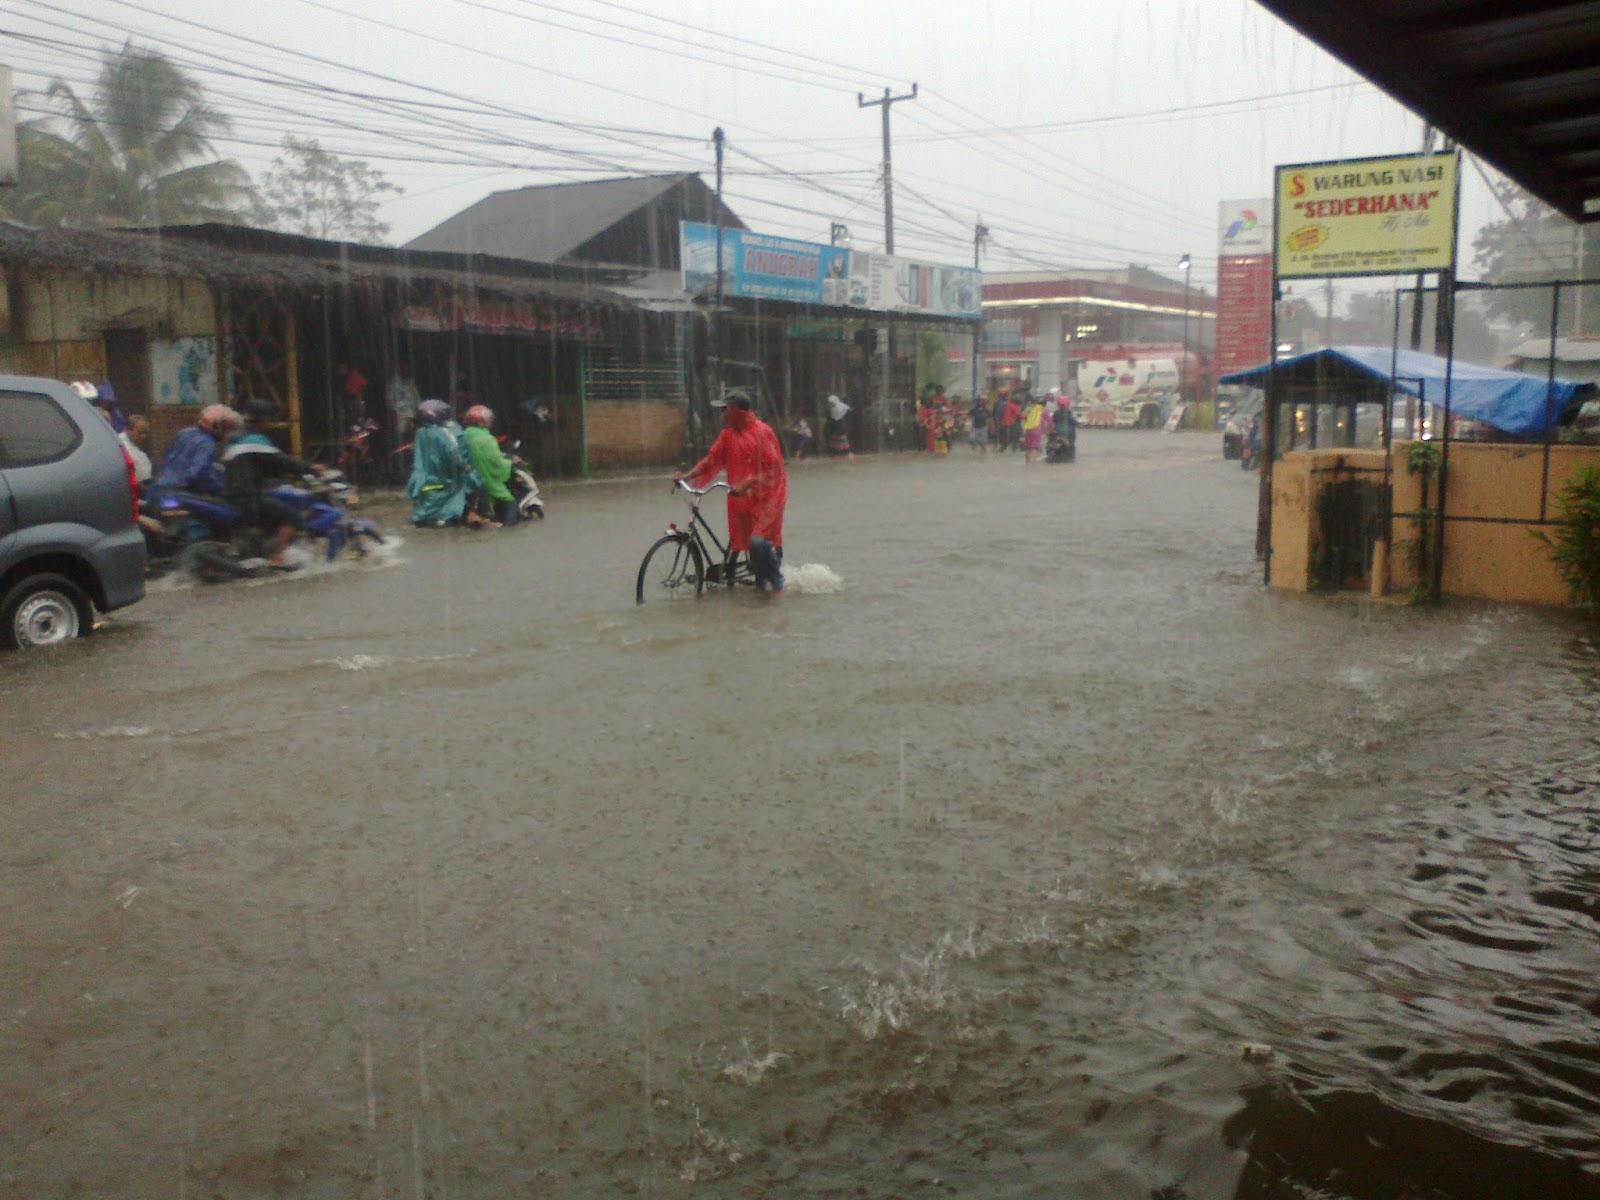 Tumbuh rezeki dibalik banjirnya Mangkubumi